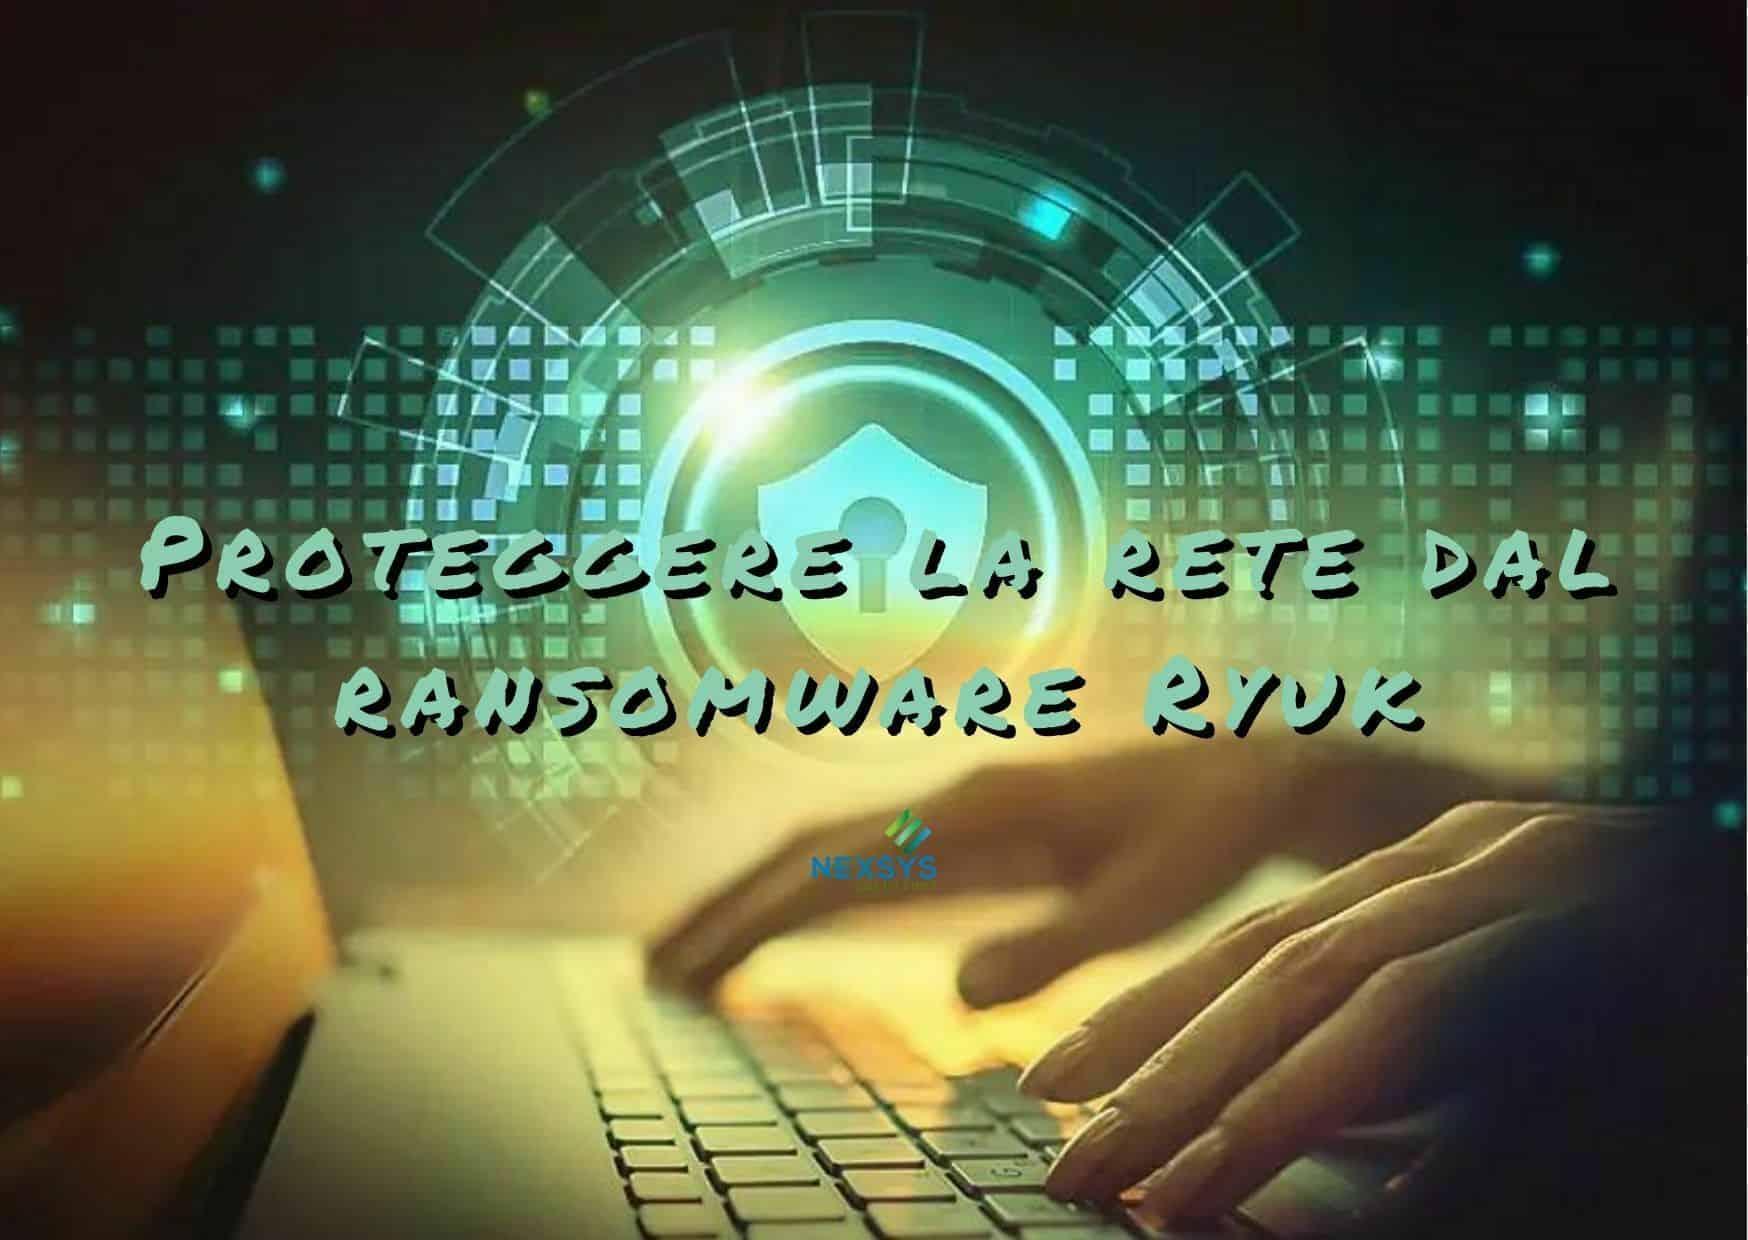 Proteggere la rete dal ransomware Ryuk